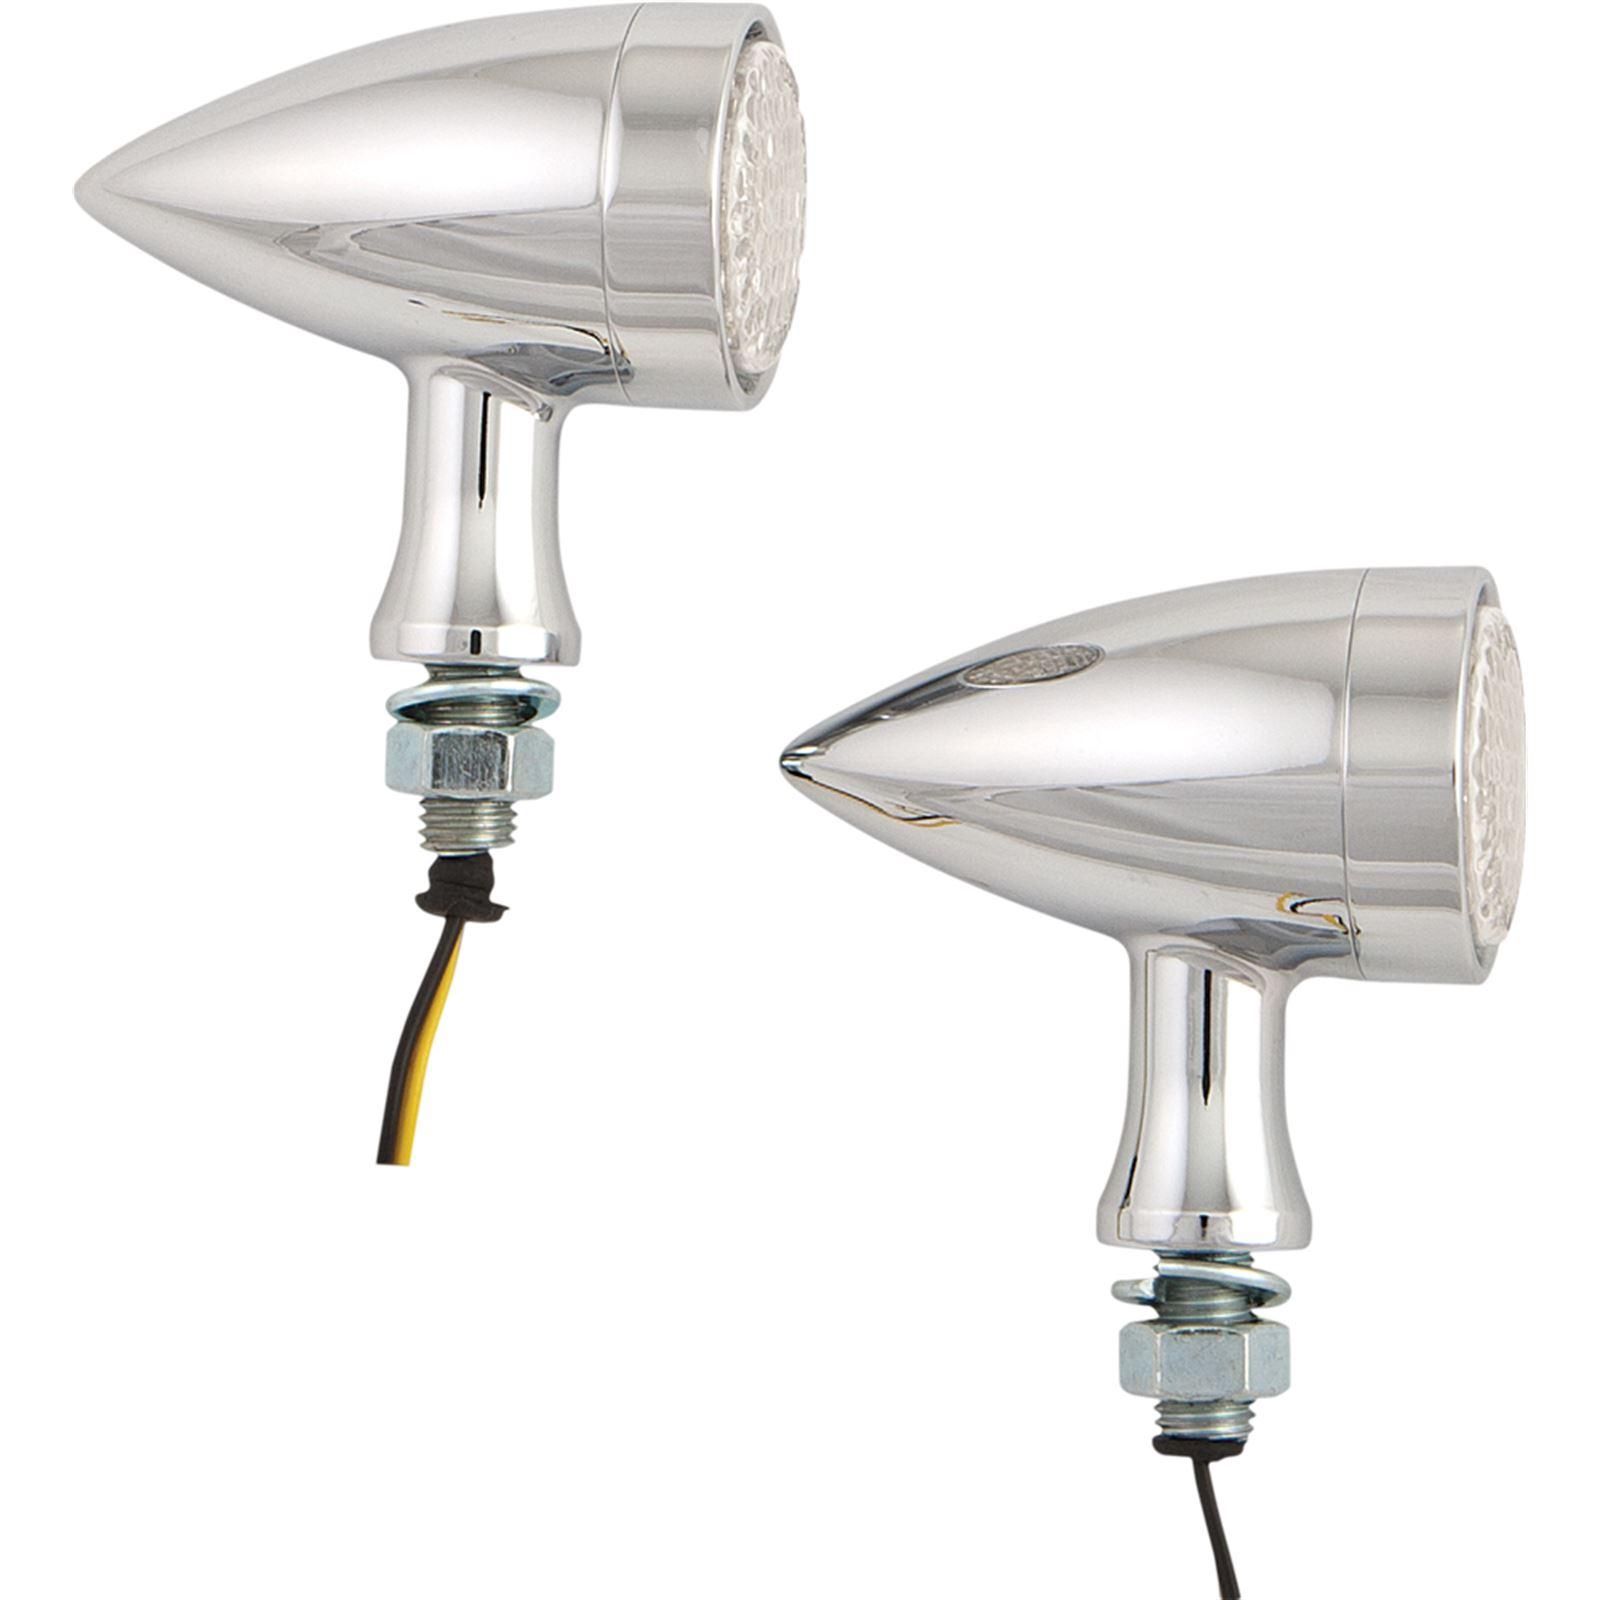 Harddrive Mini LED Bullet Marker Light